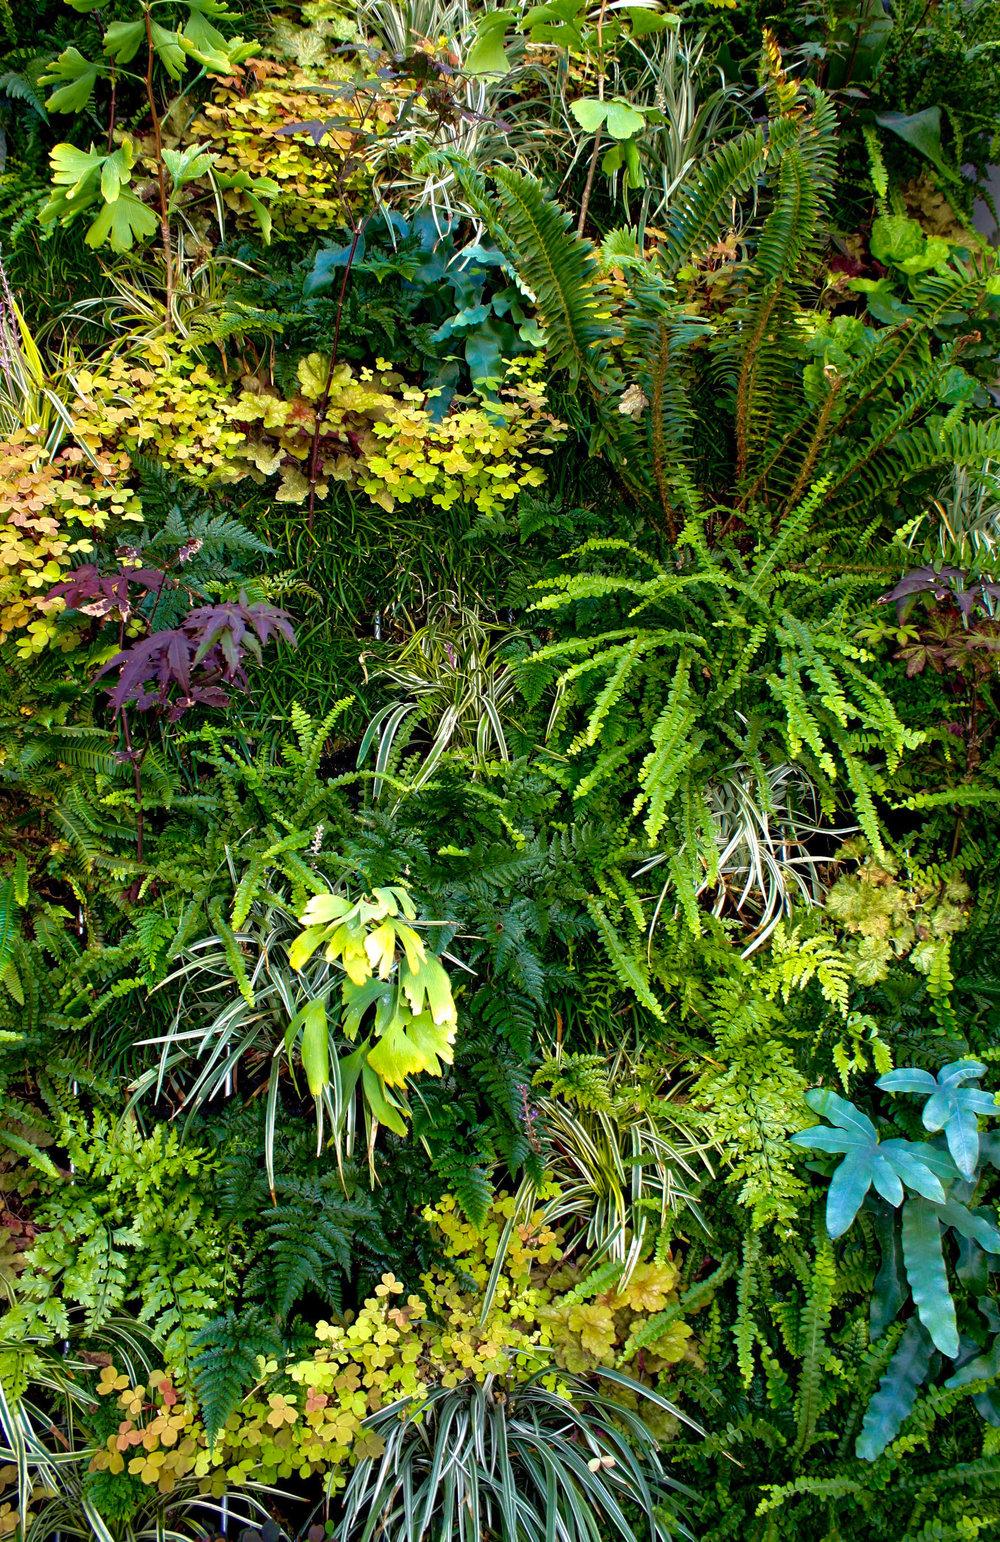 lush-foliage-Lindsey-Graves.jpeg